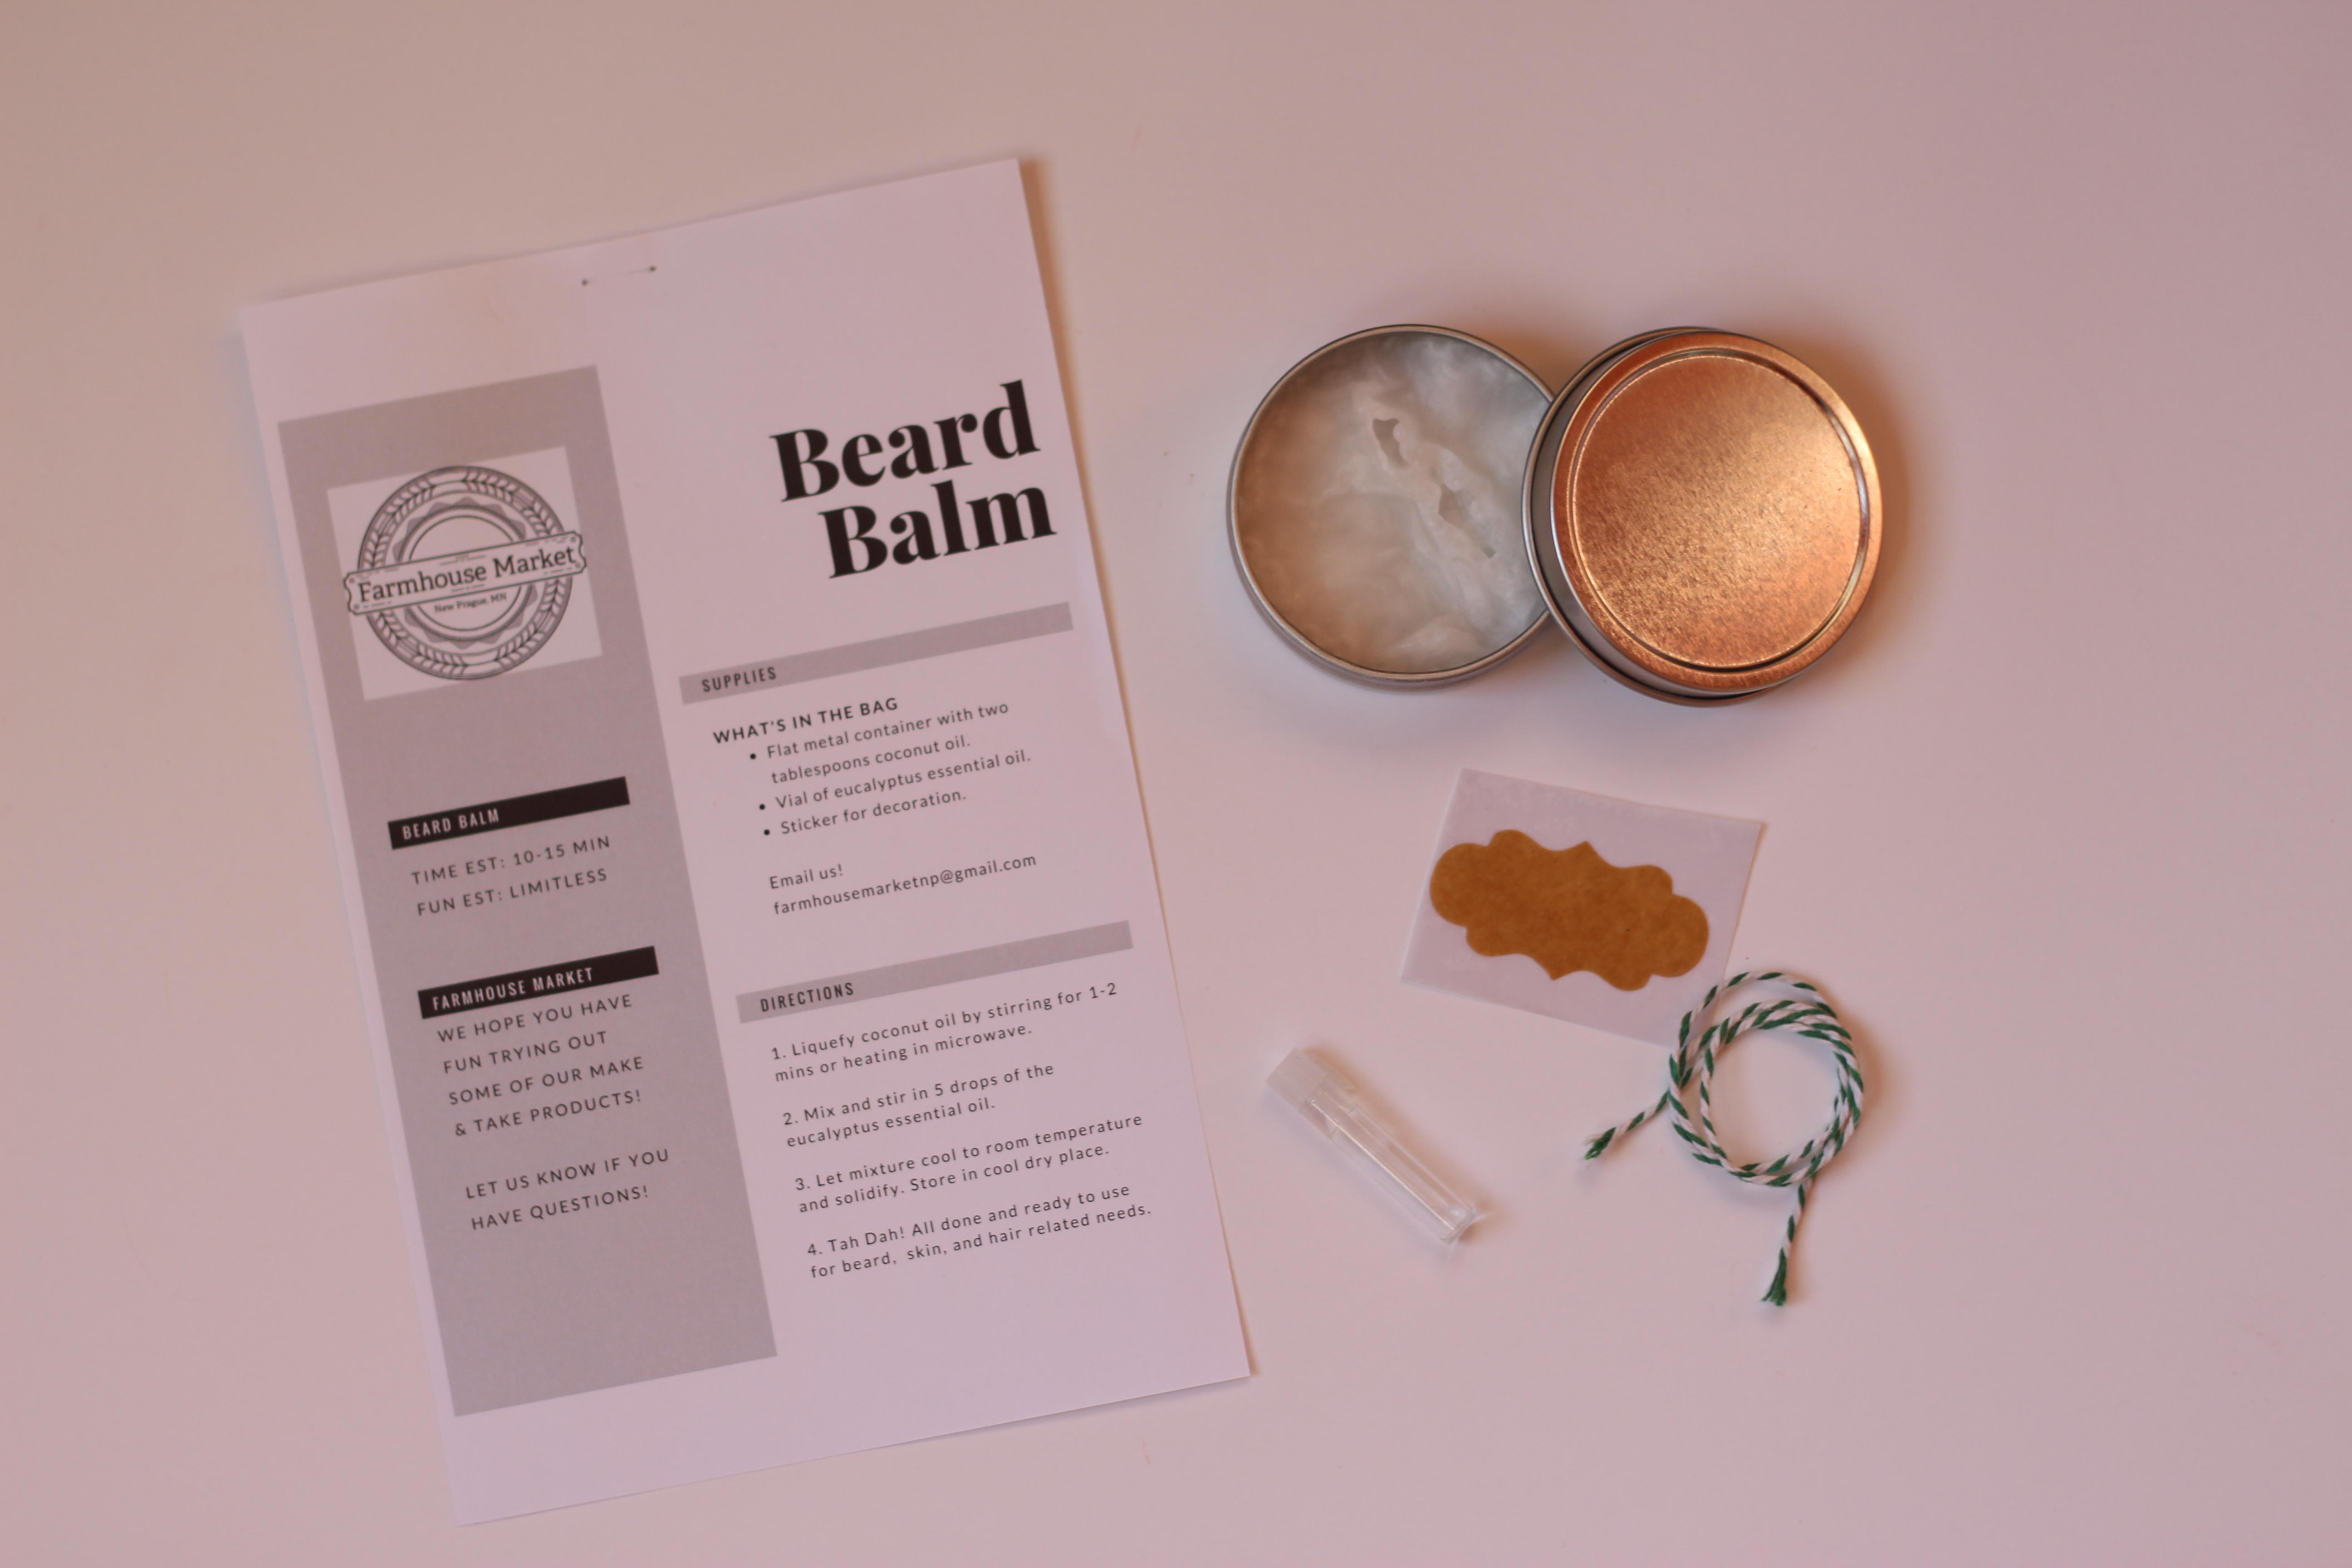 Make-Your-Own Beard Balm Kit